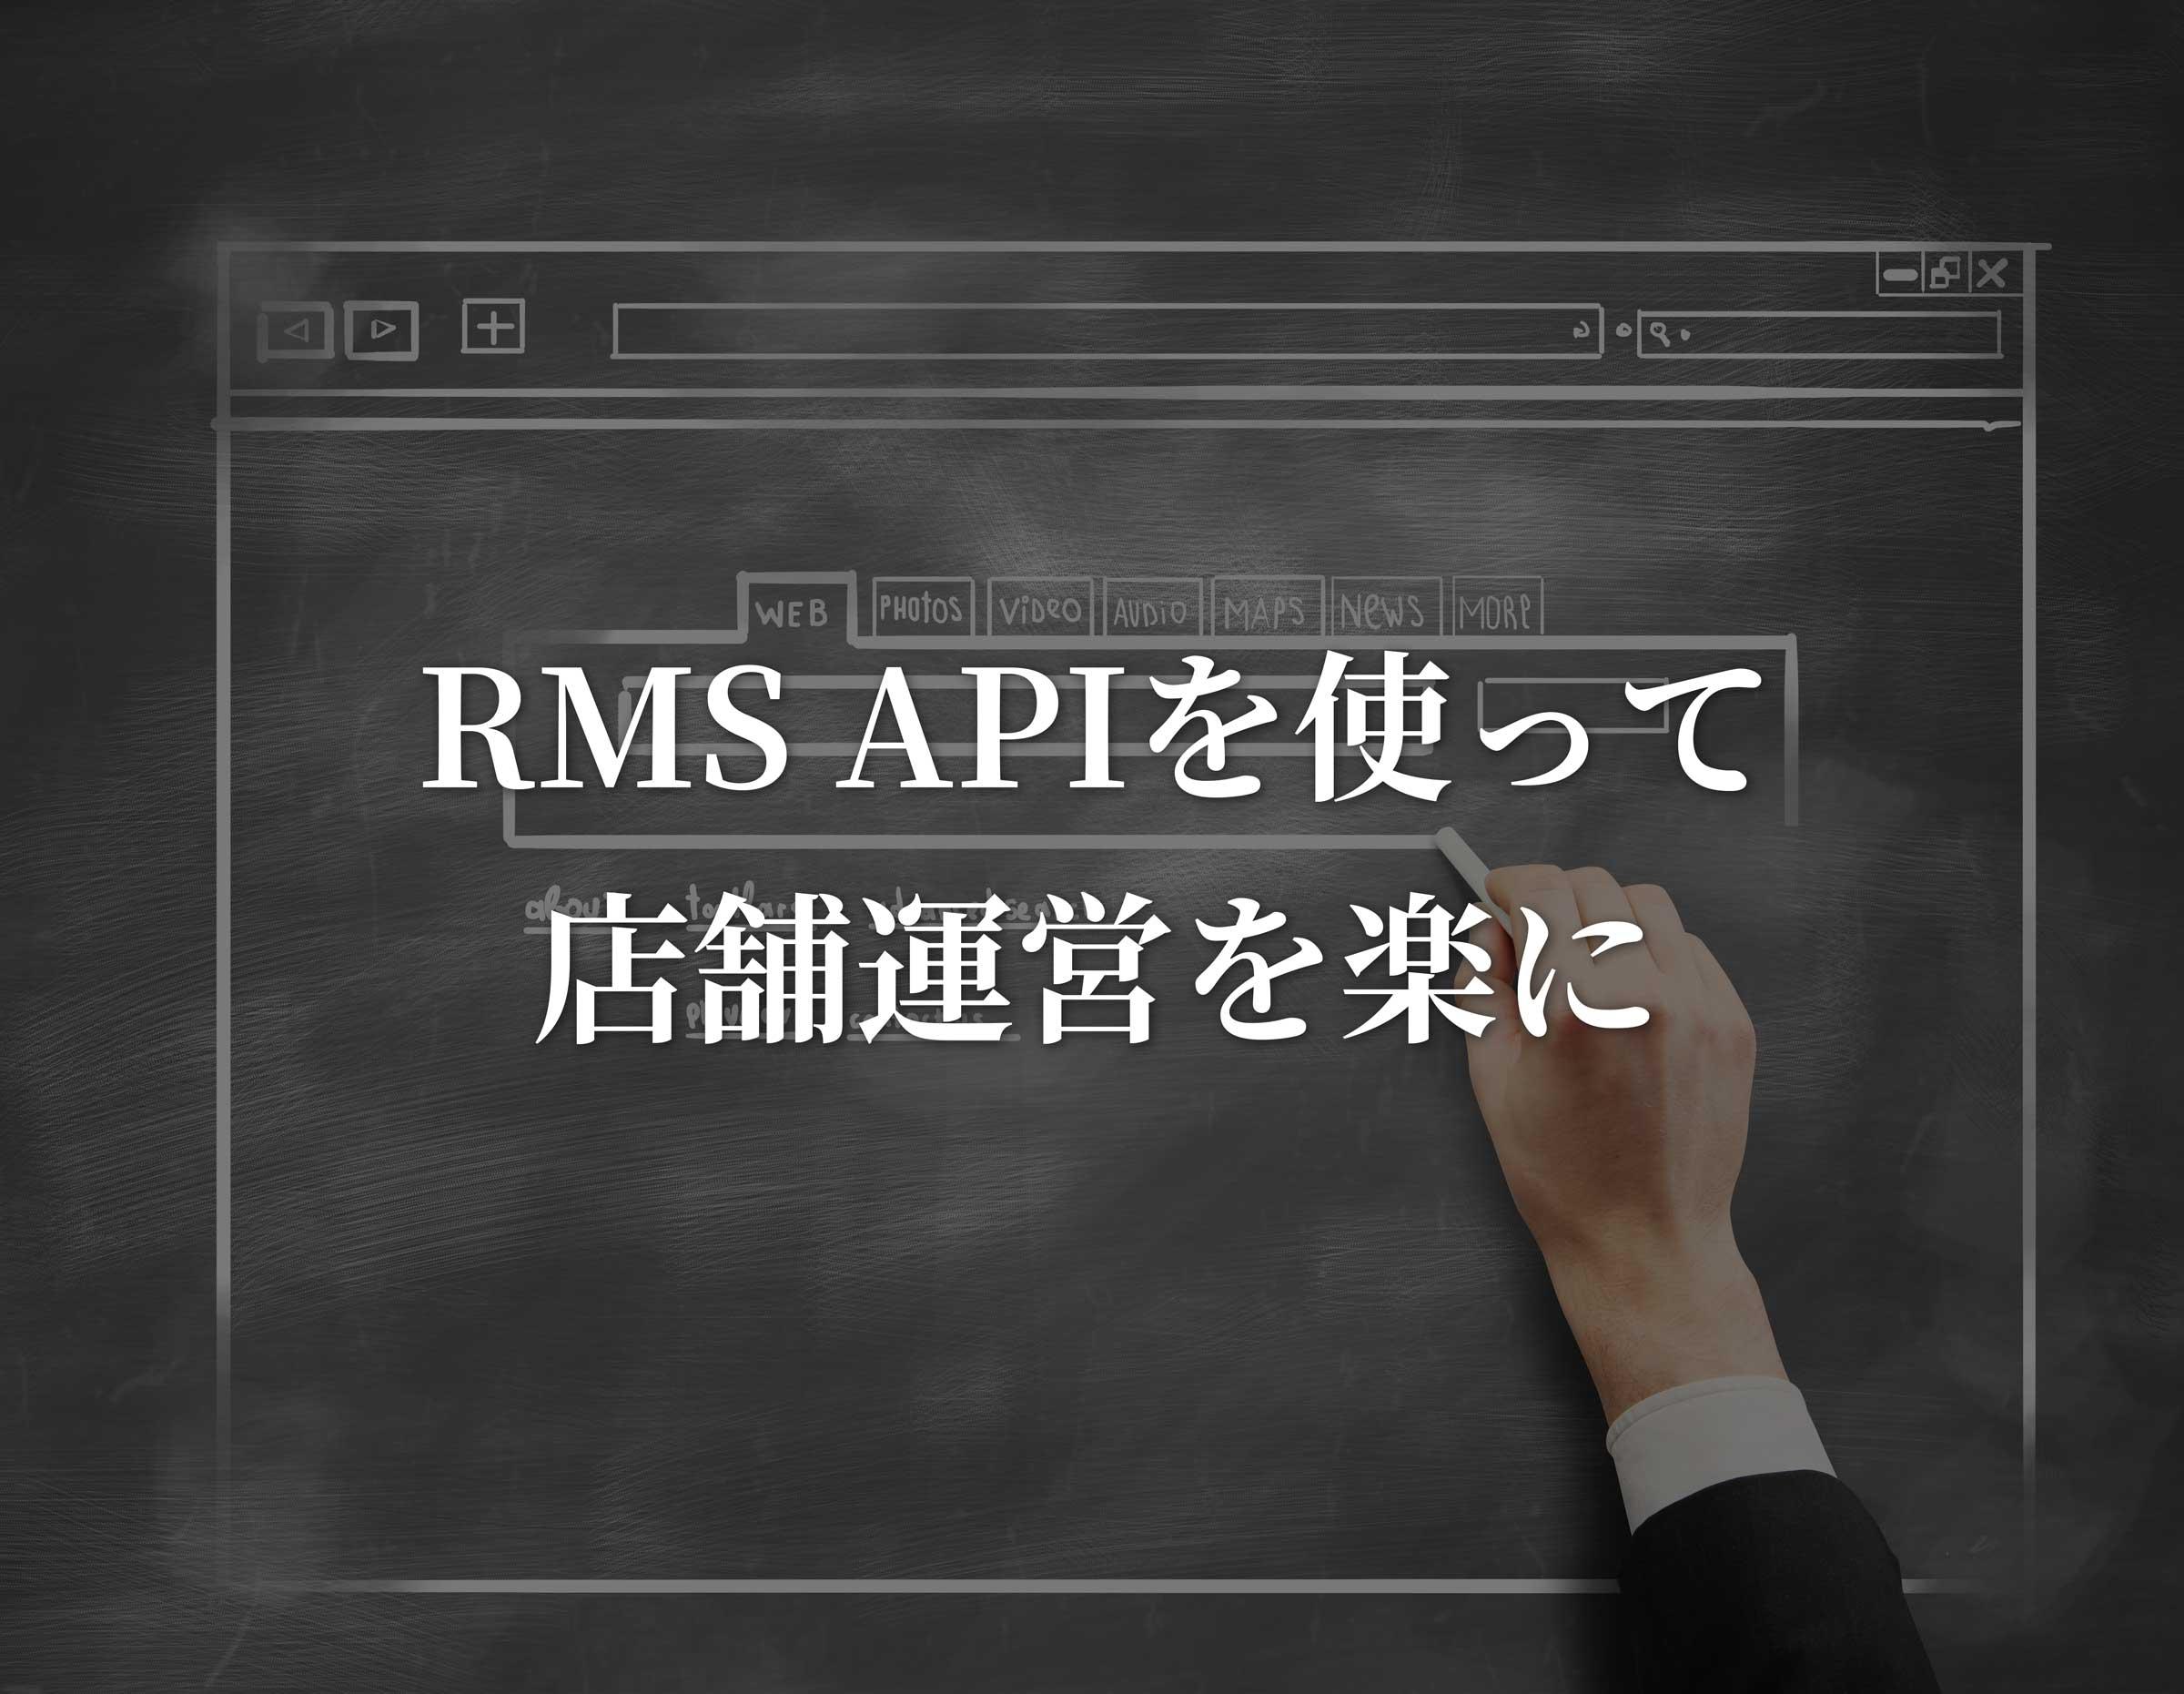 rms apiサンプル作成&記事執筆